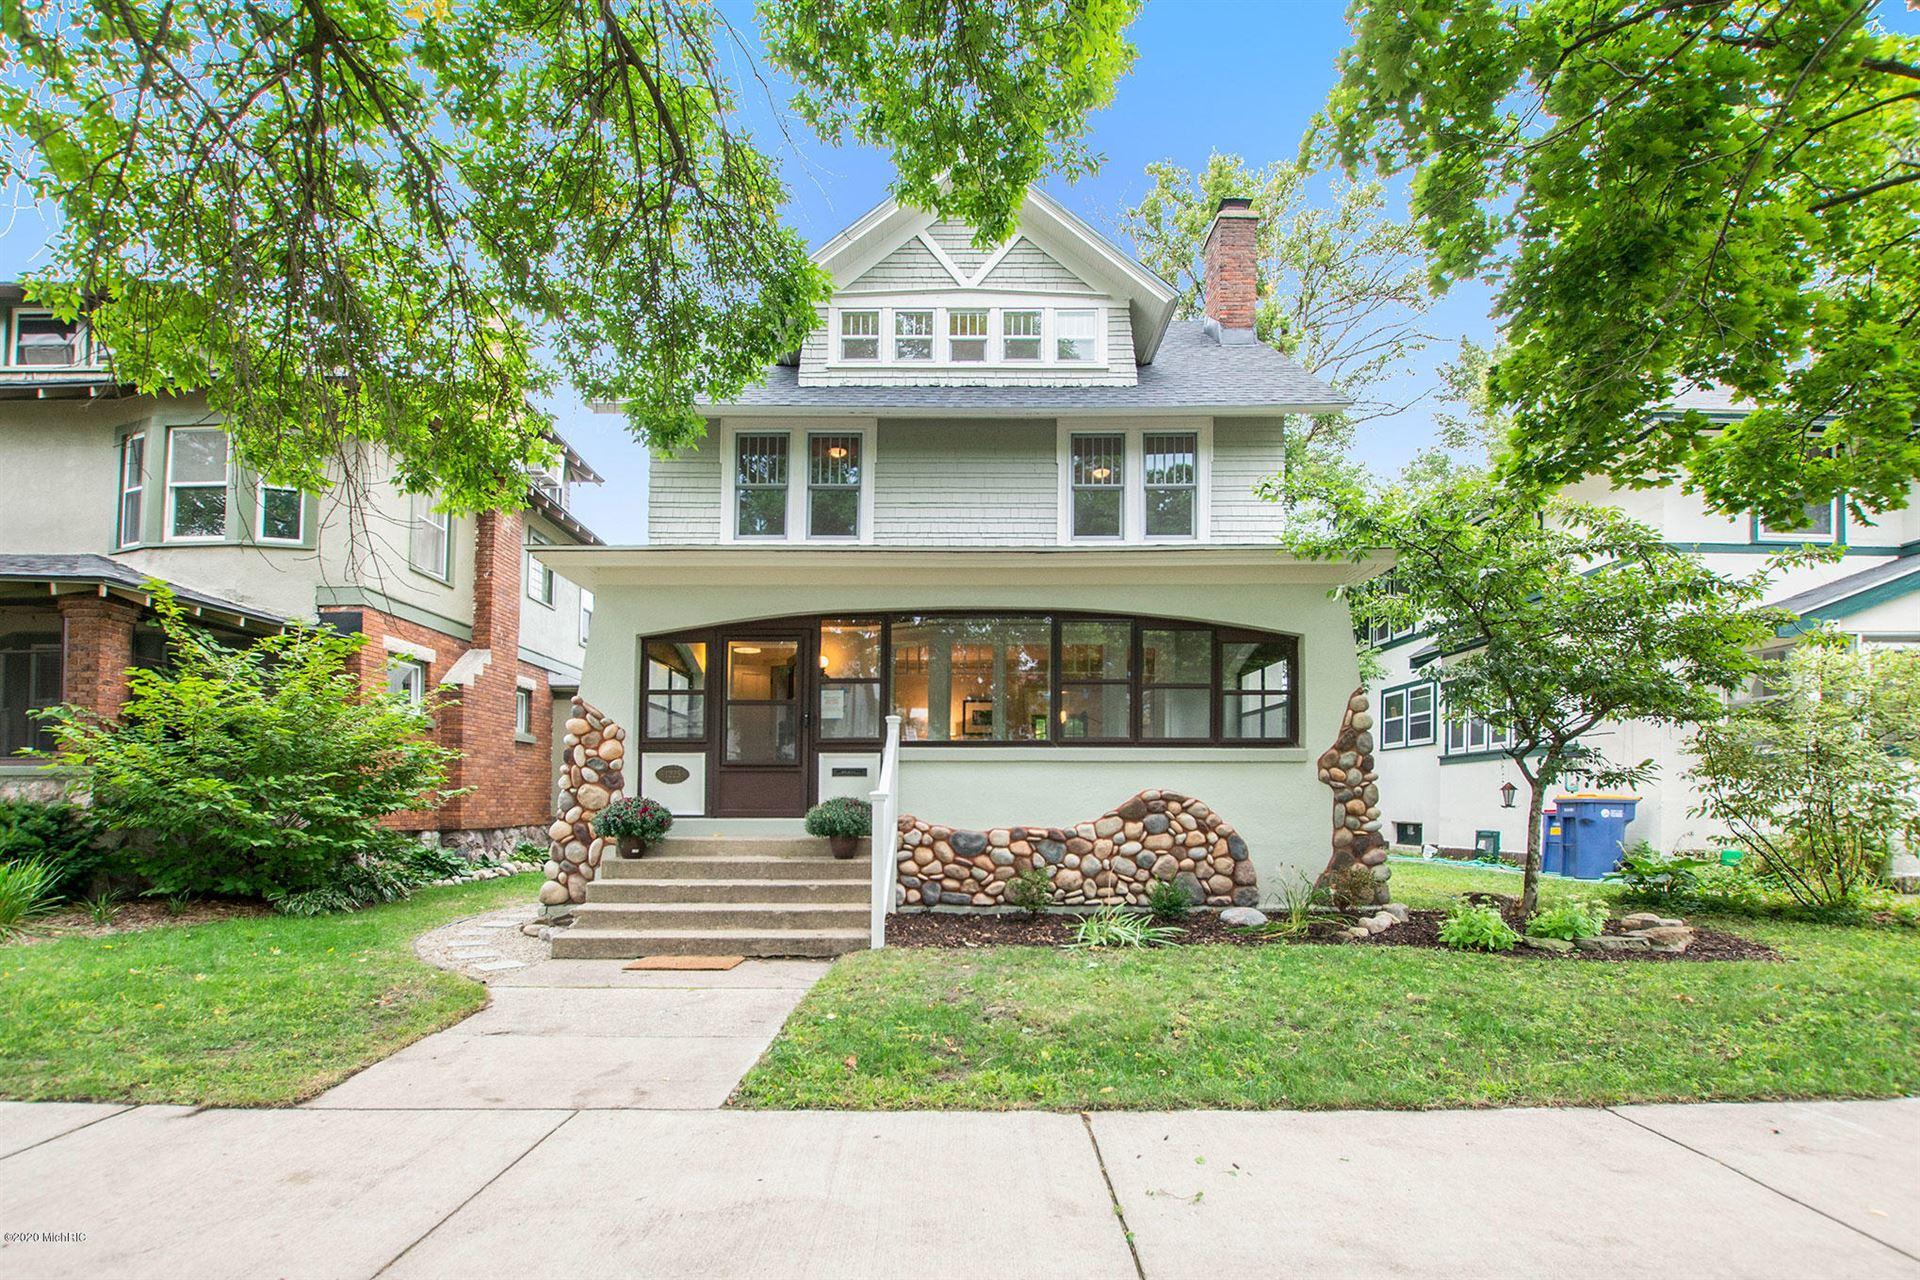 1225 Thomas Street SE, Grand Rapids, MI 49506 - MLS#: 20036302